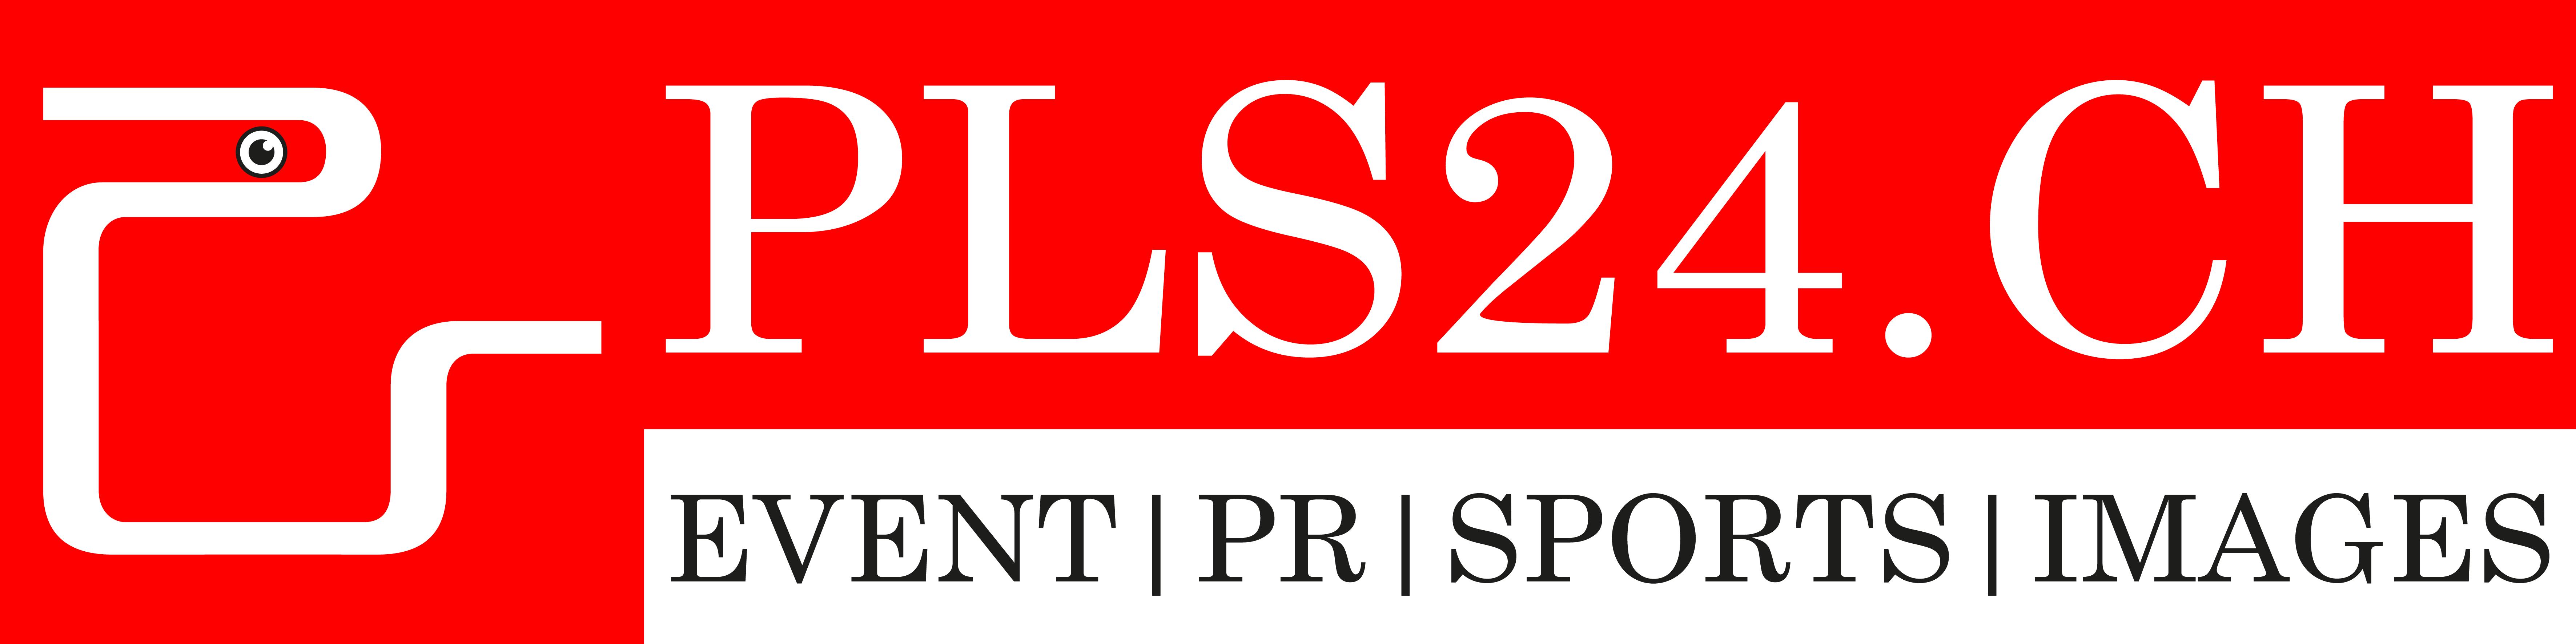 PLS24.CH | Image Gallery